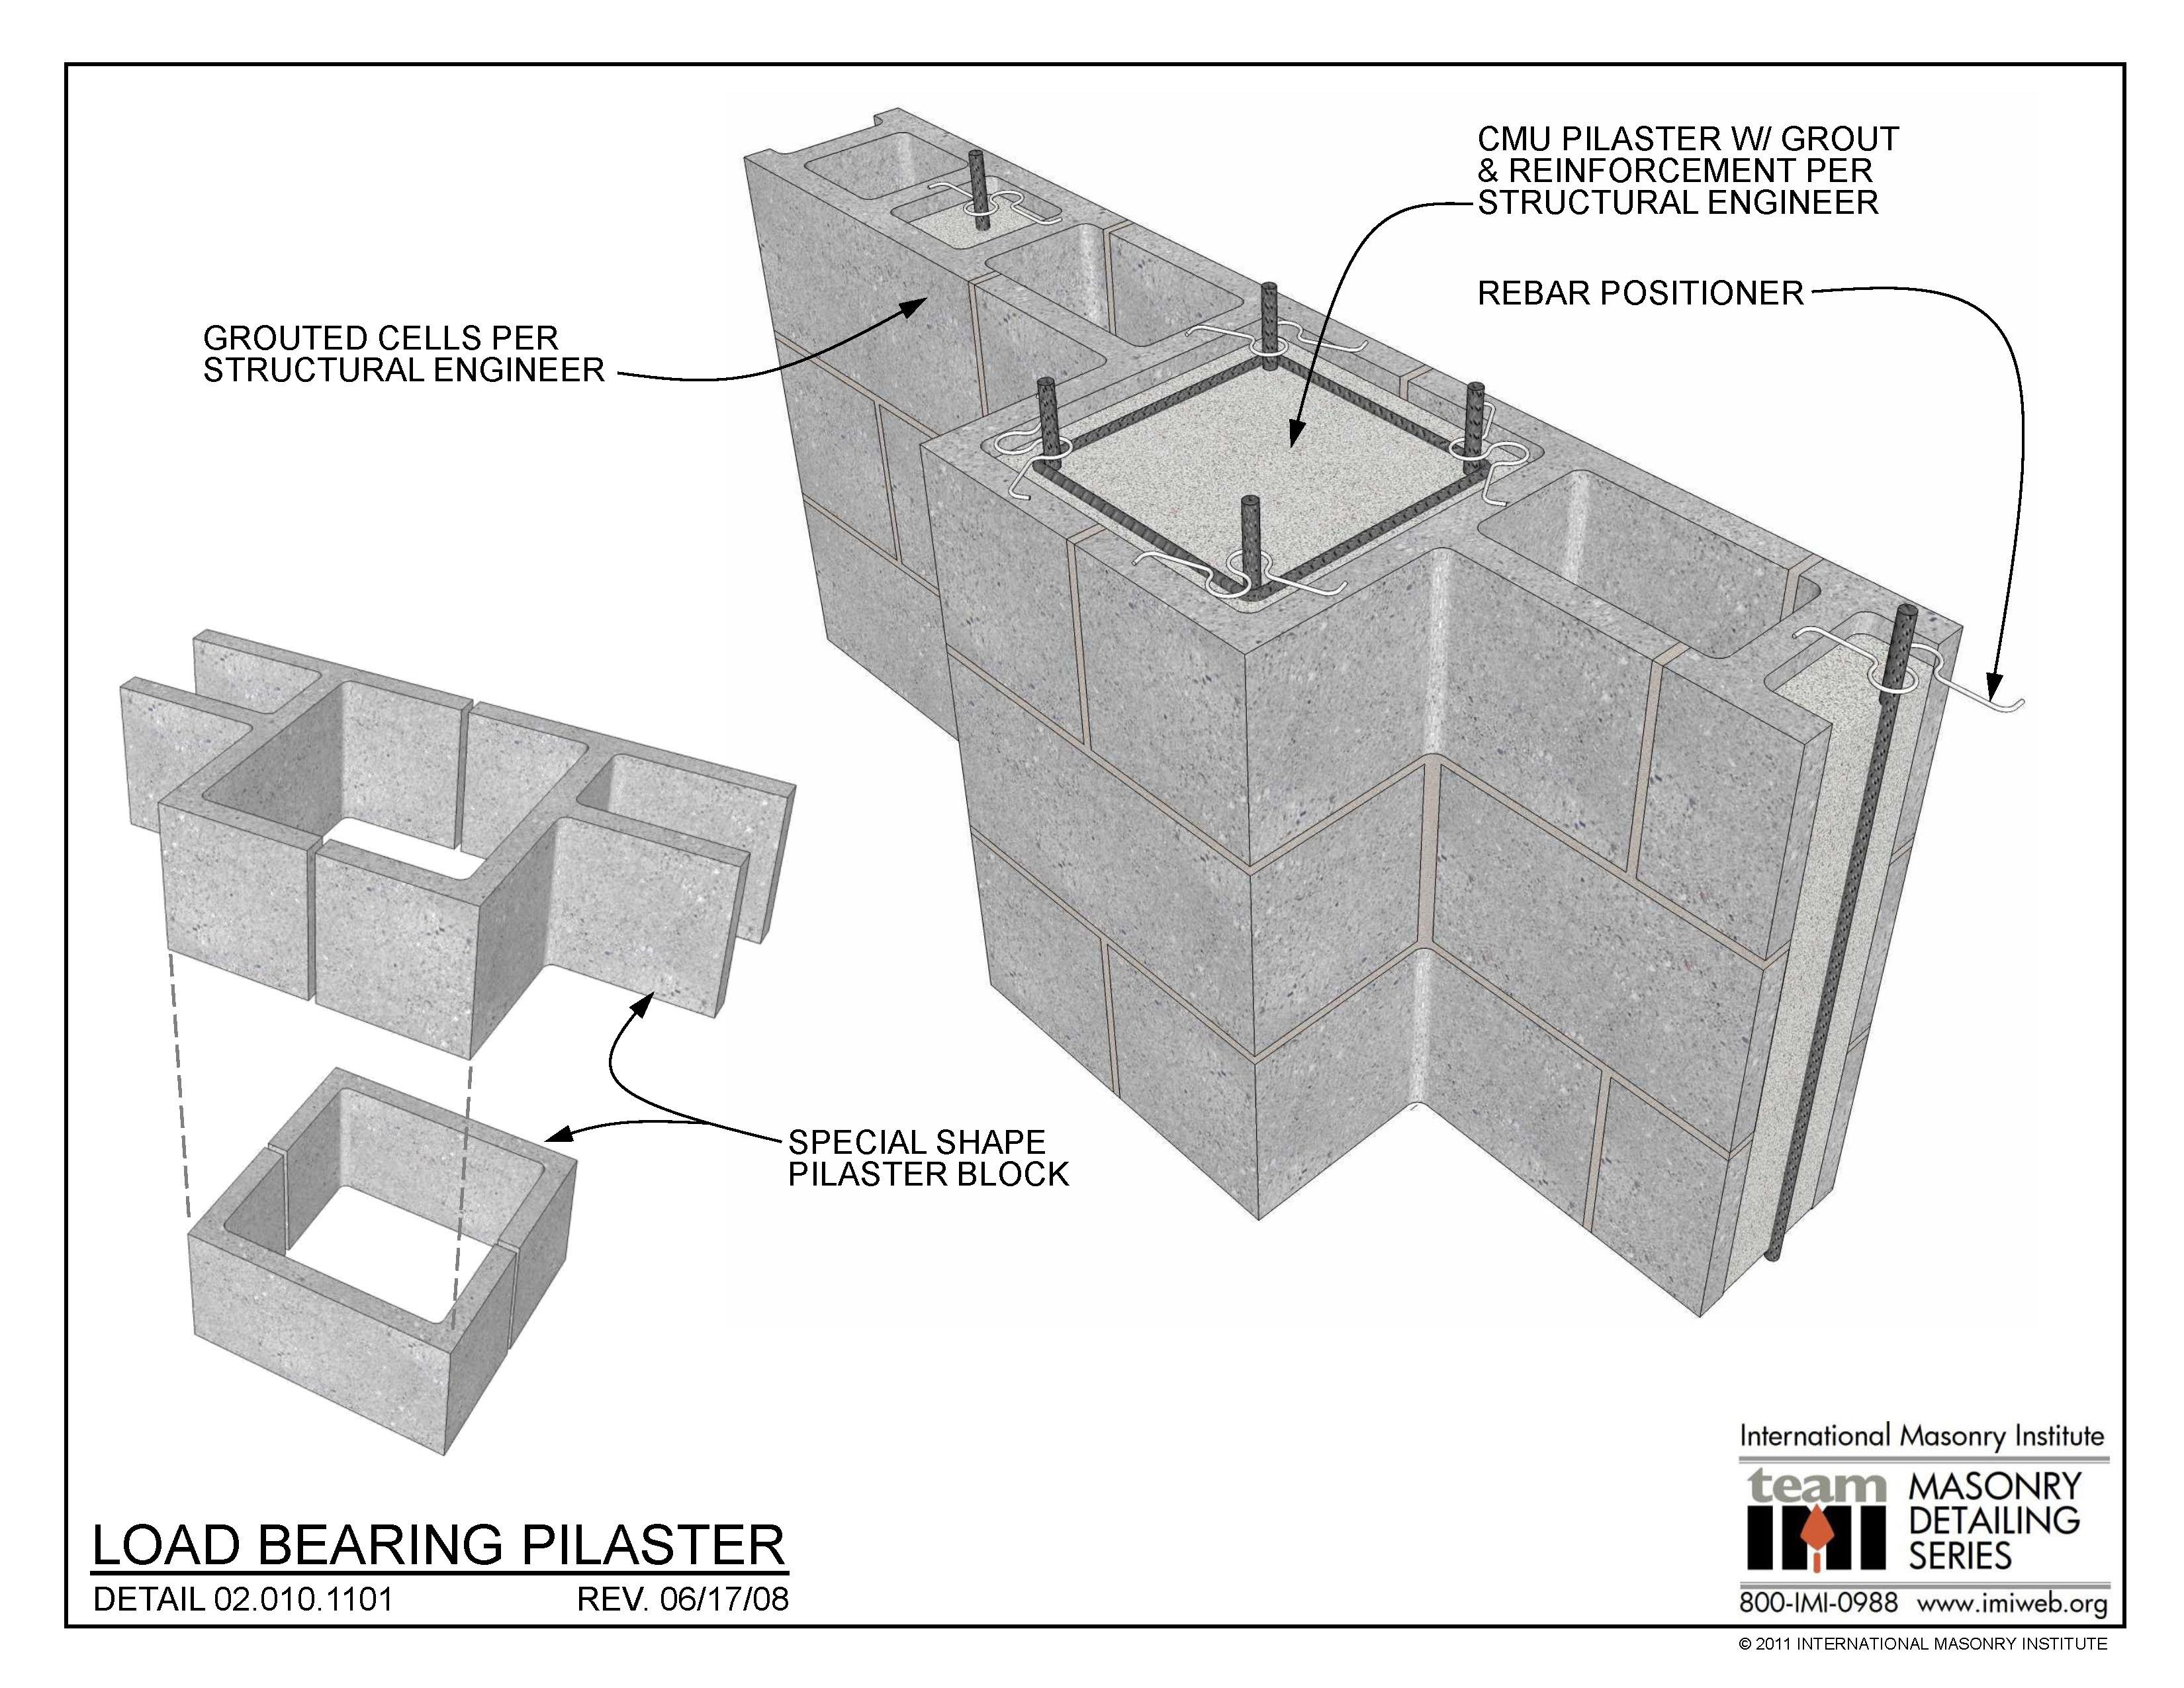 02 010 1101 Load Bearing Pilaster International Masonry